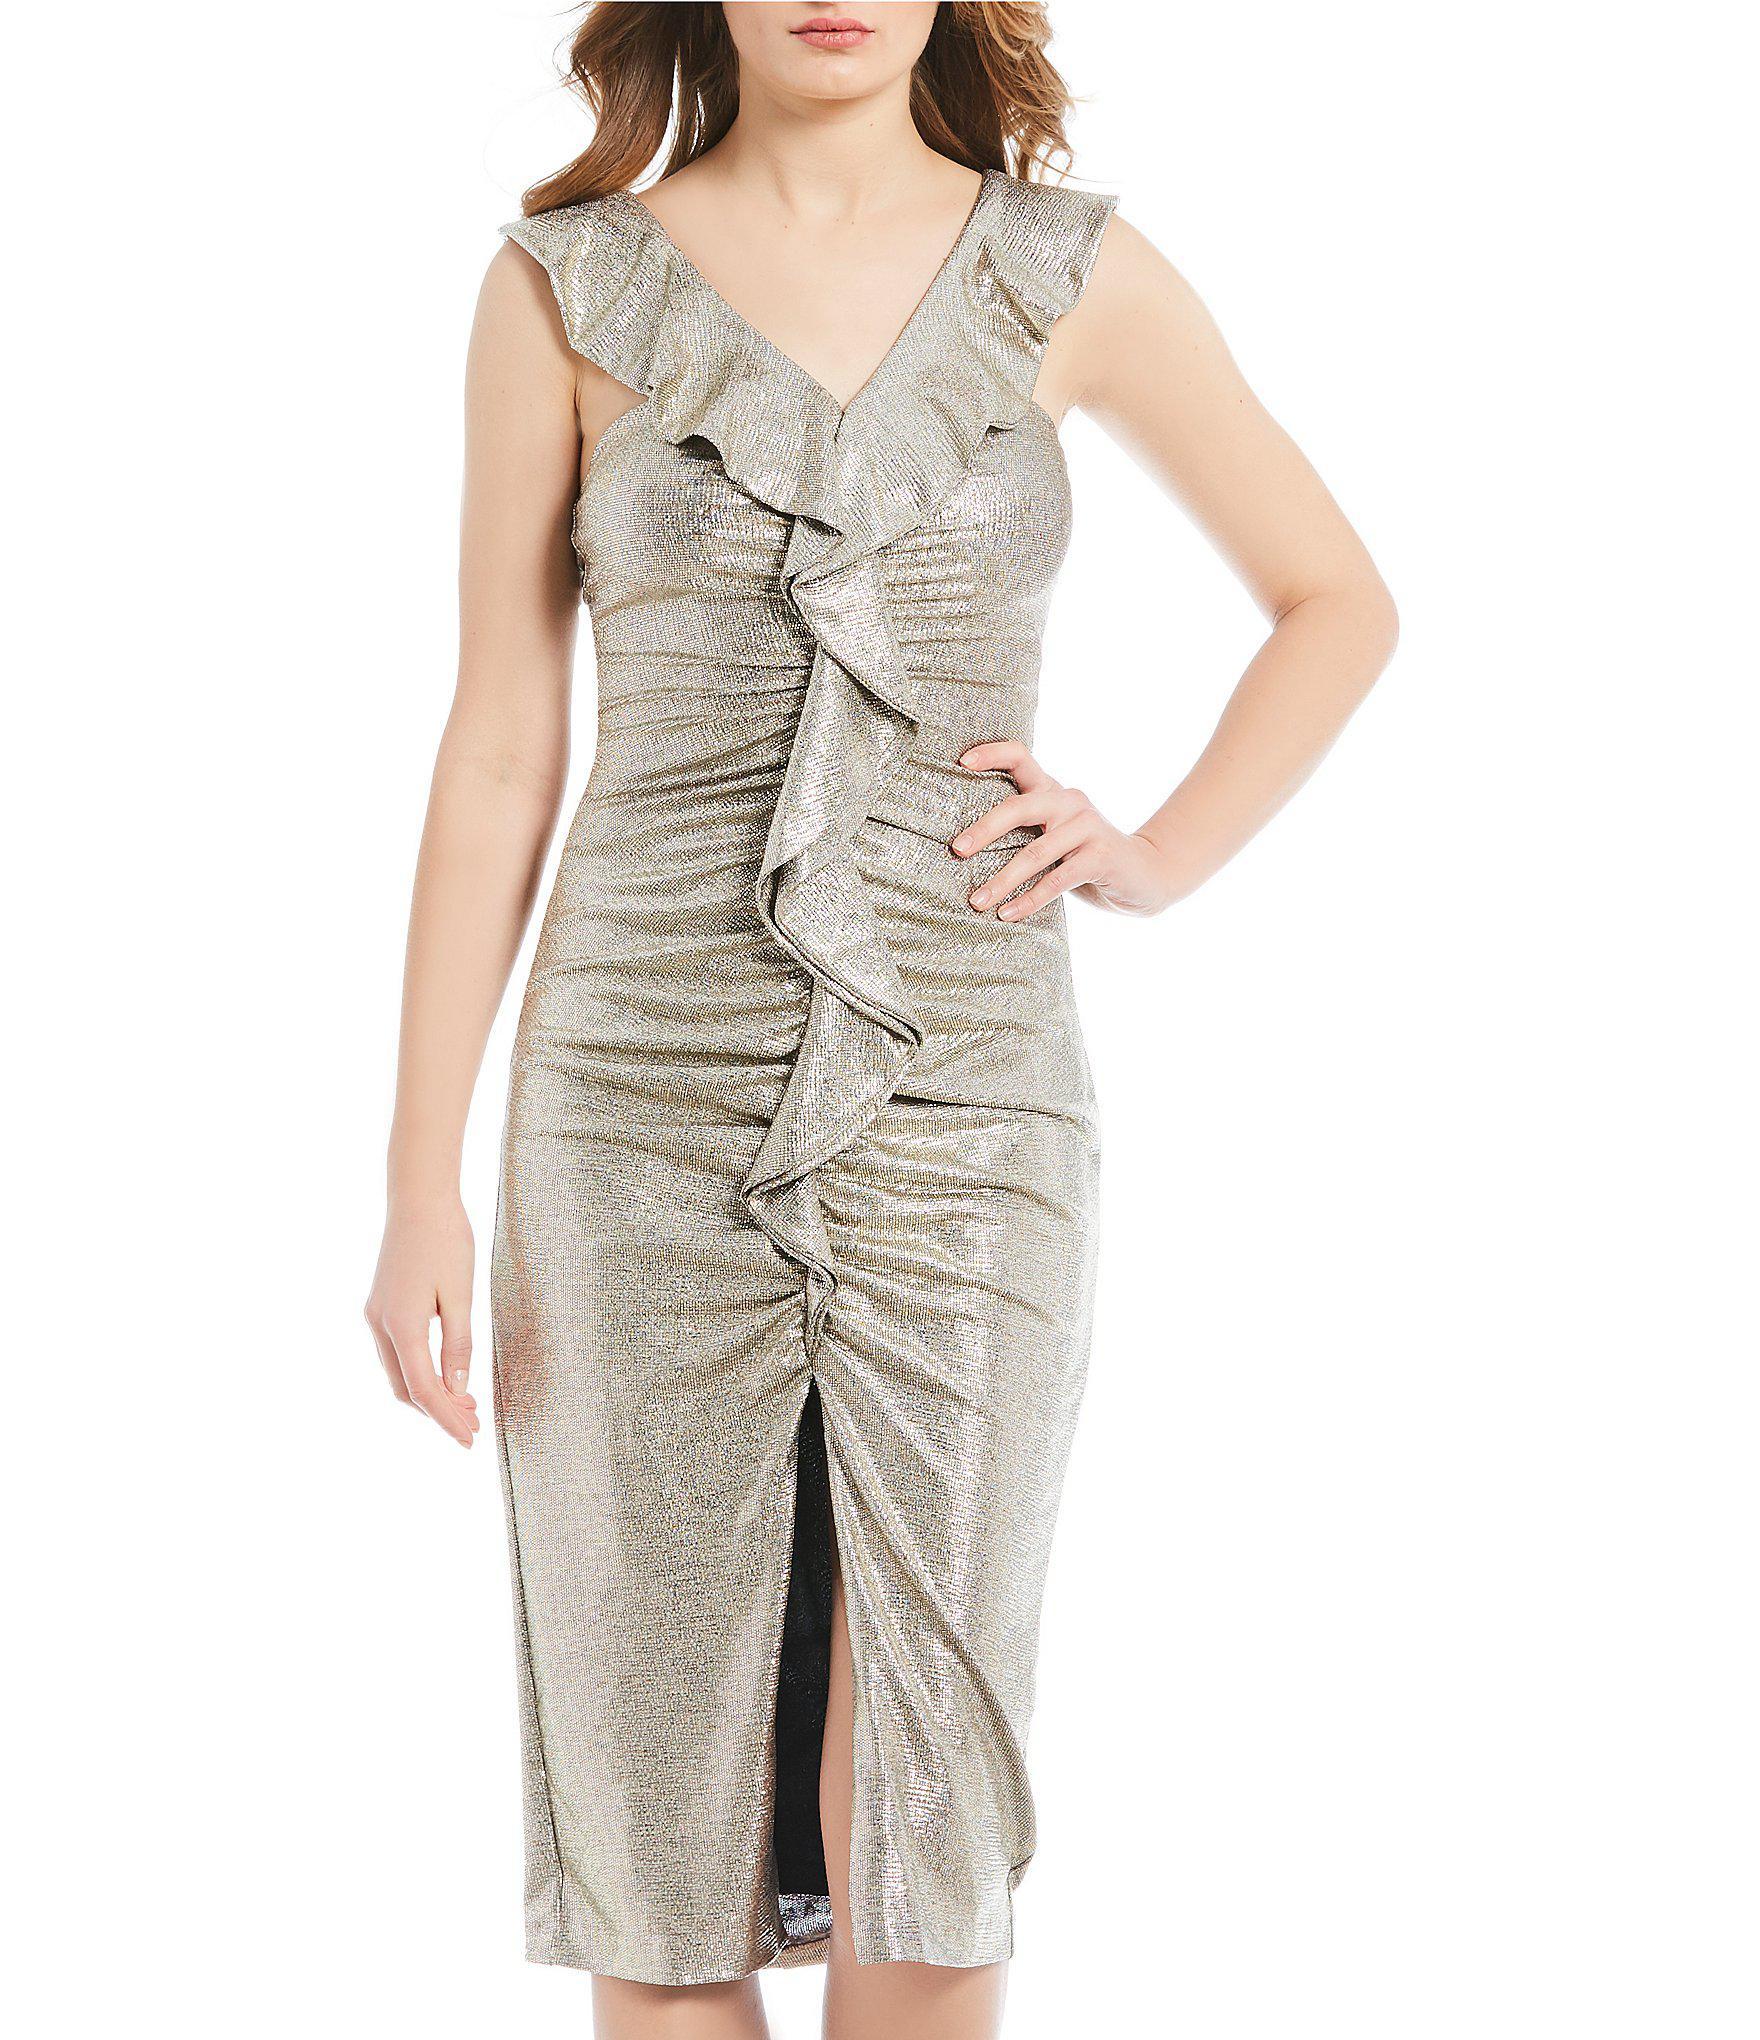 840fcbbe261 Gianni Bini - Metallic Jody Rouched Ruffle Front Slit Midi Dress - Lyst.  View fullscreen